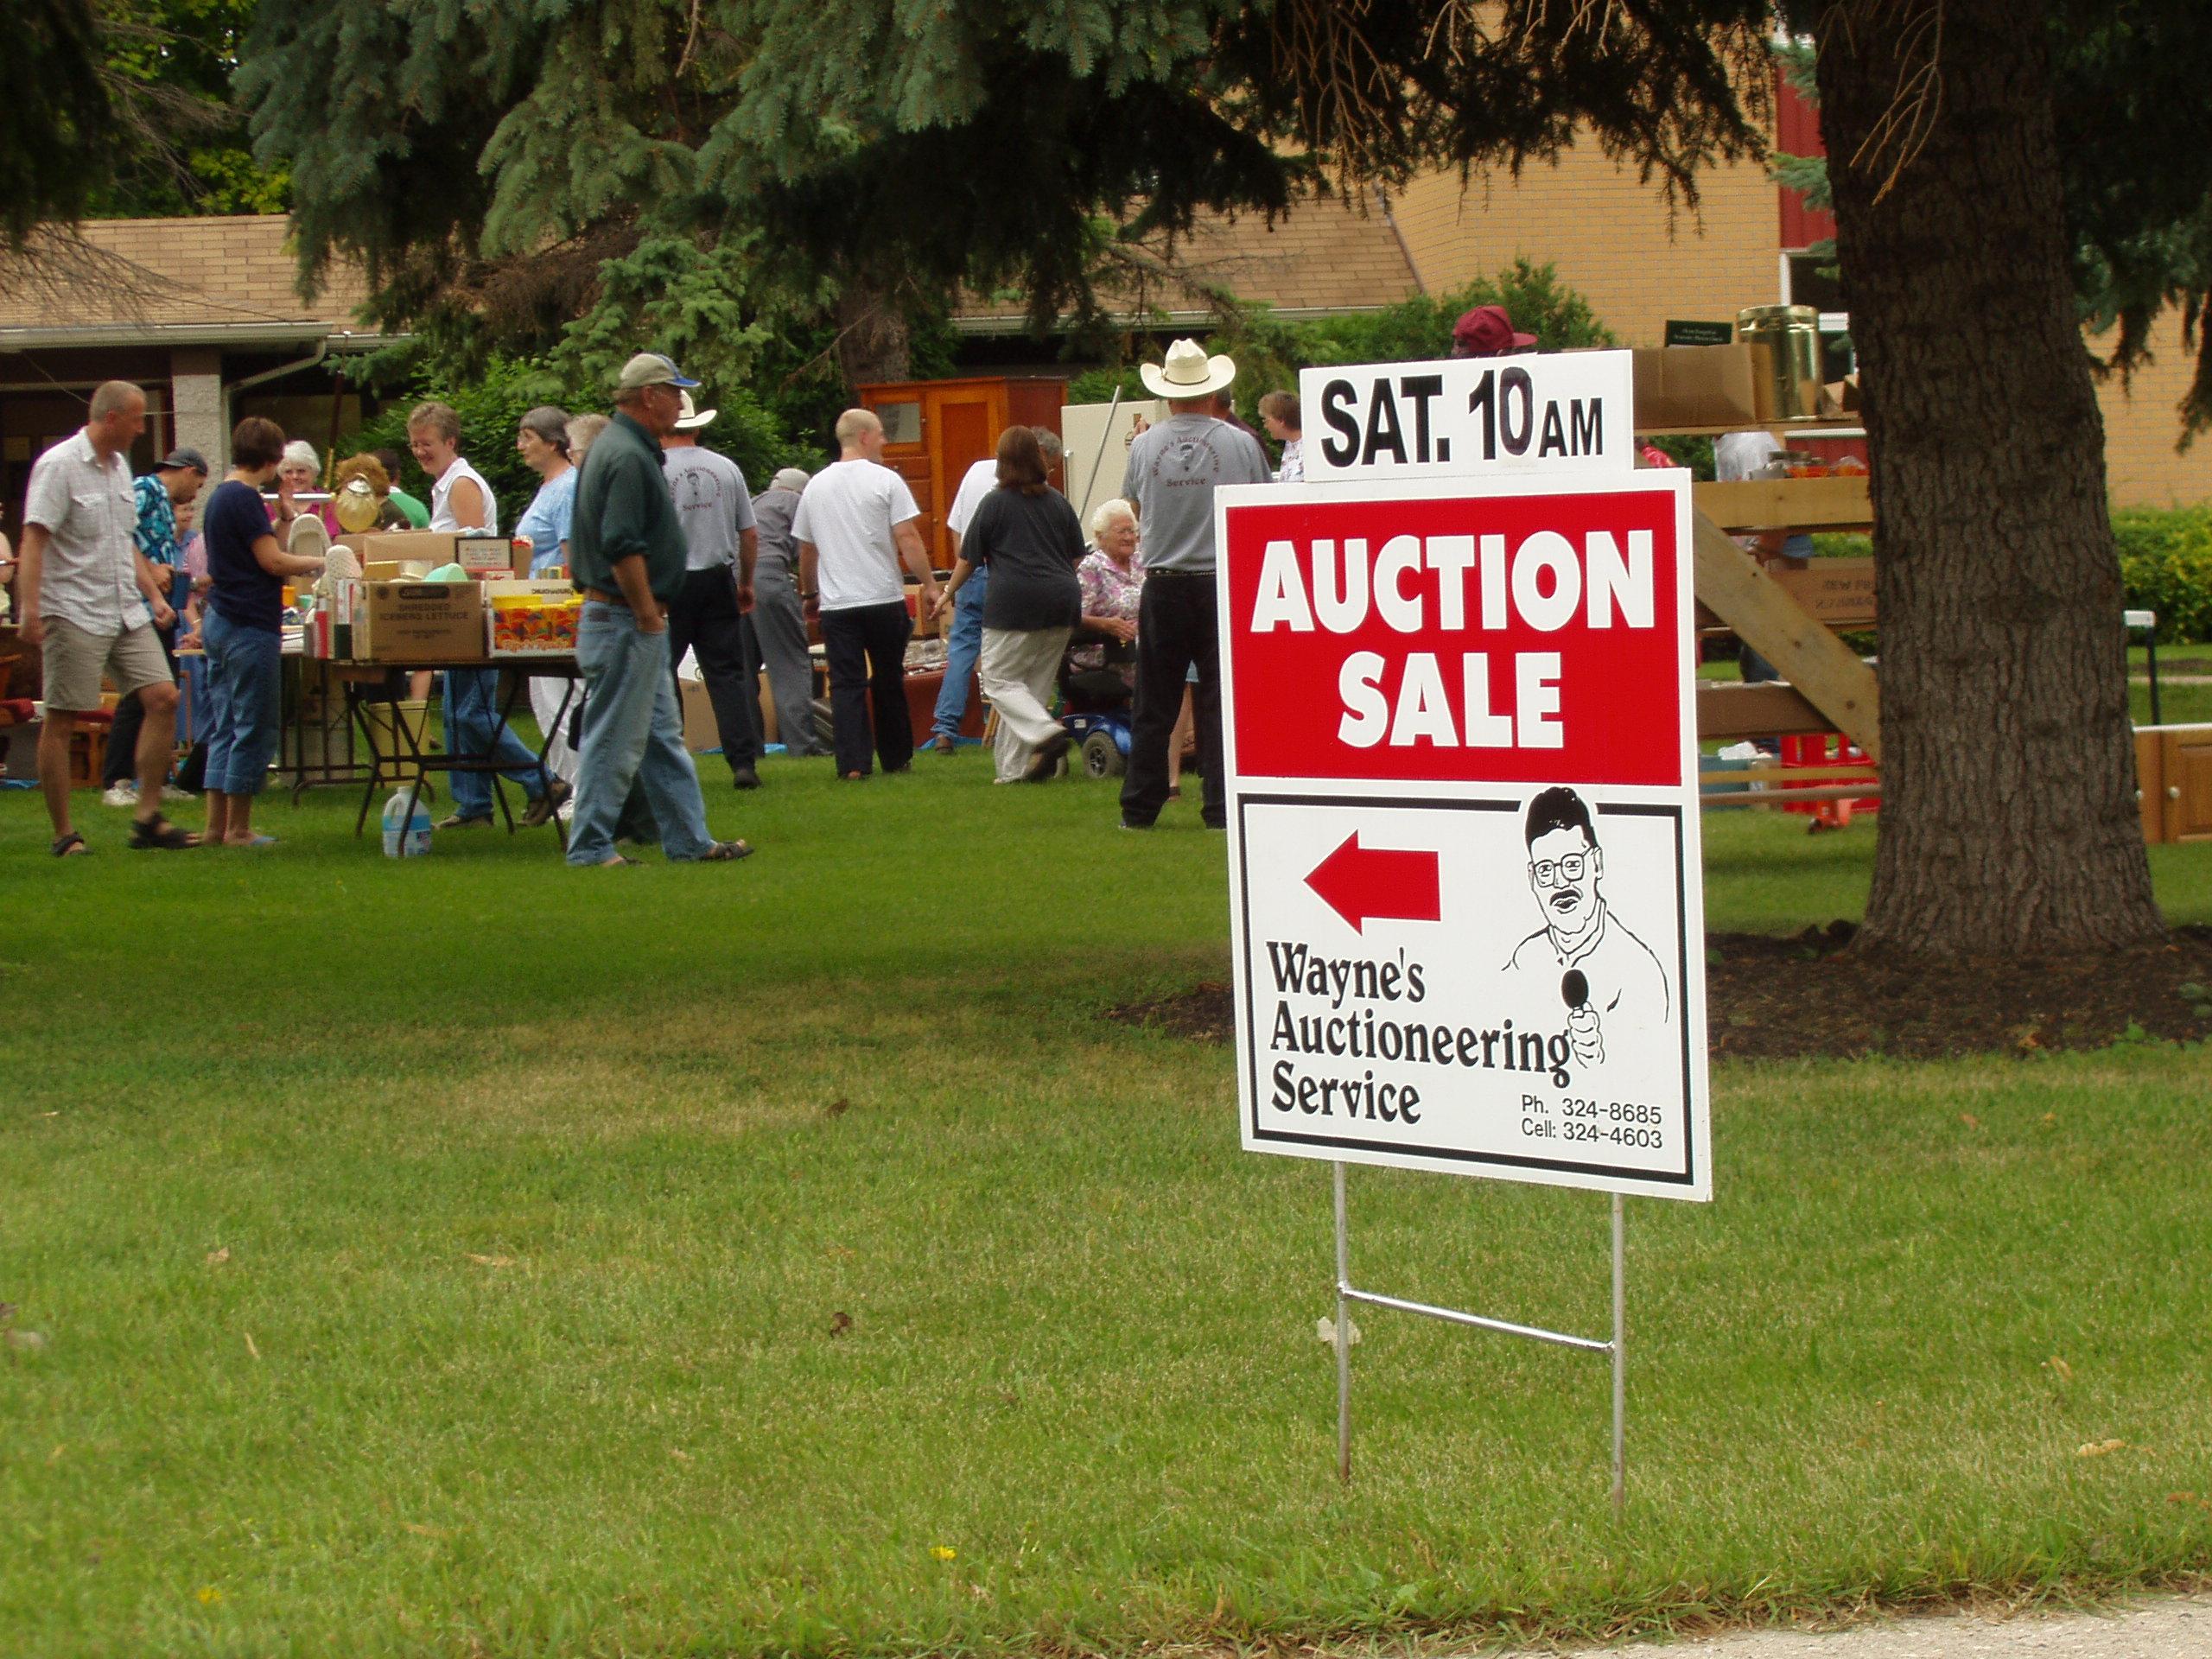 Wayne's Auctioneering Service